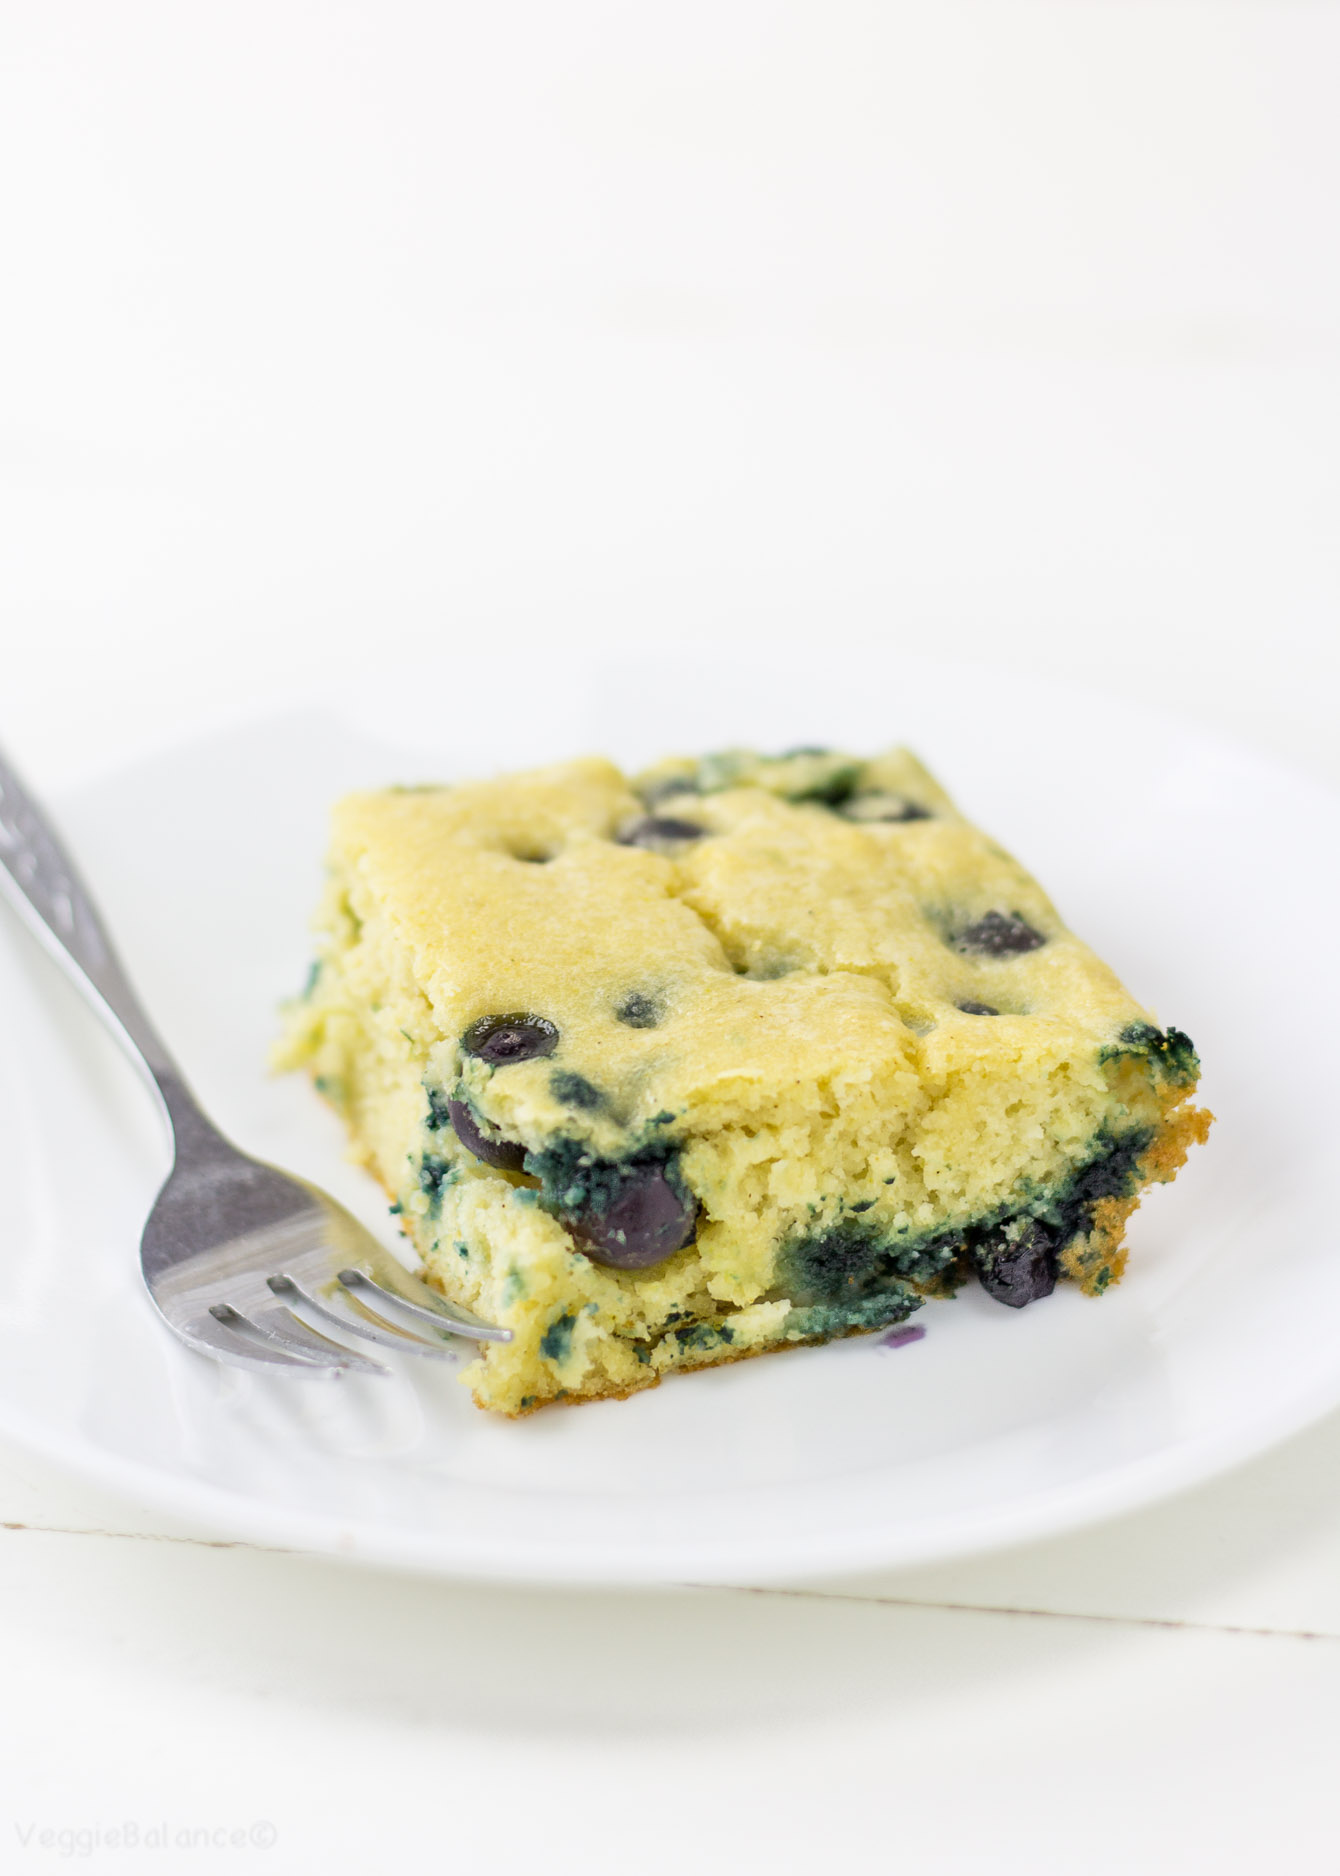 Blueberry Pancake Casserole recipe Gluten Free - Veggiebalance.com